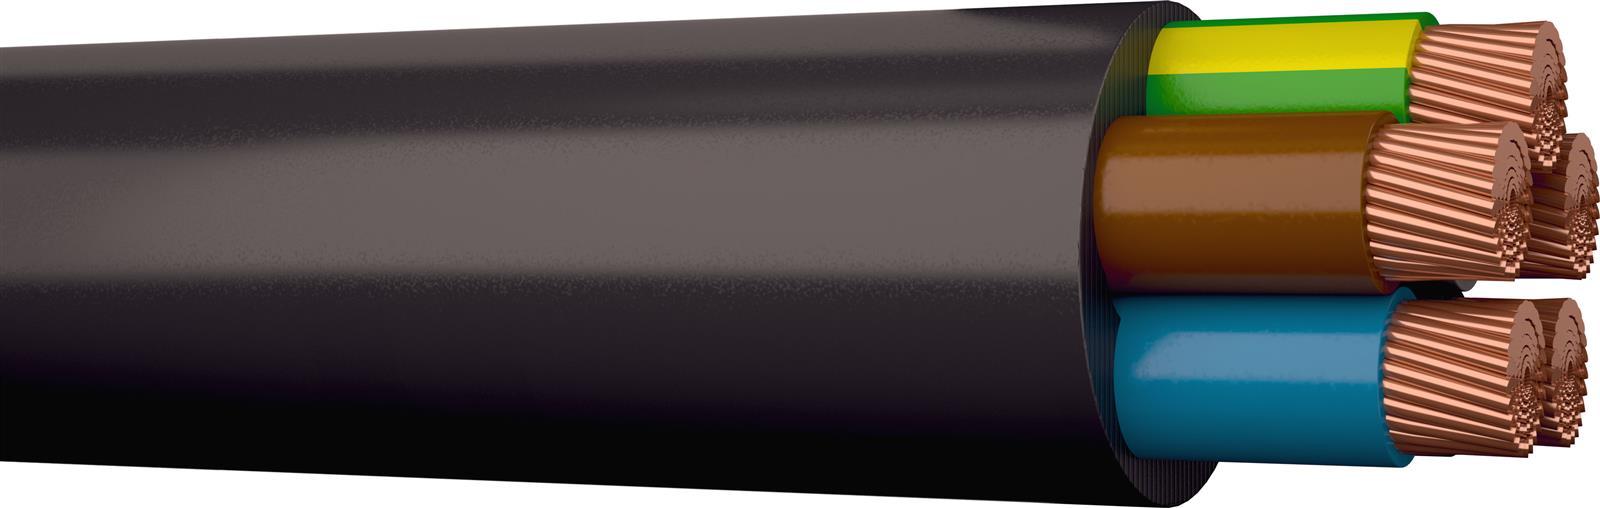 ACEFLEX-PURE 5G1,5